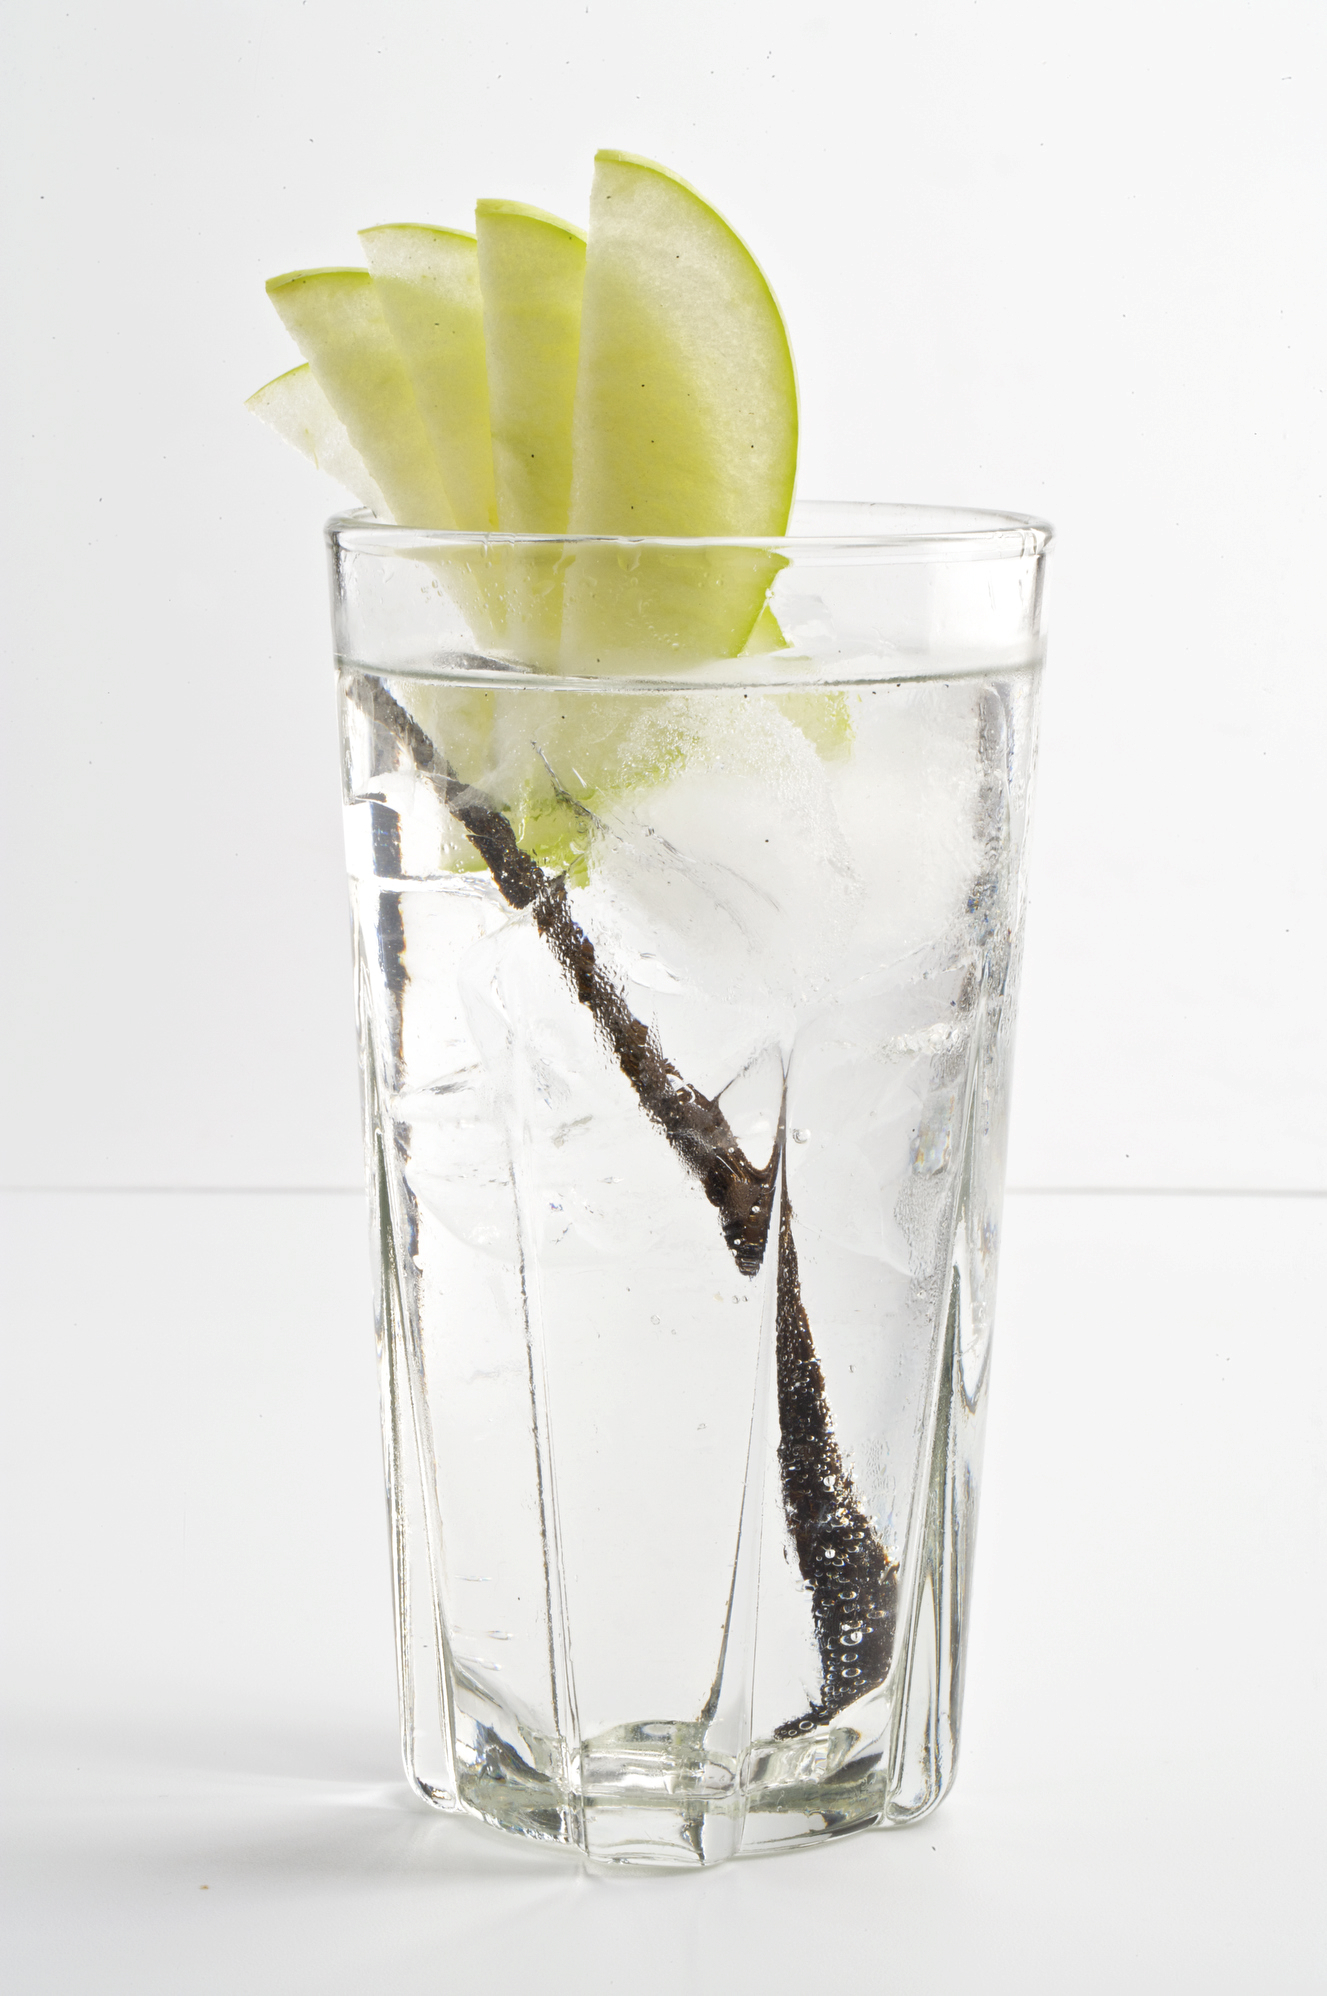 ¿Es bueno beber agua con limón?